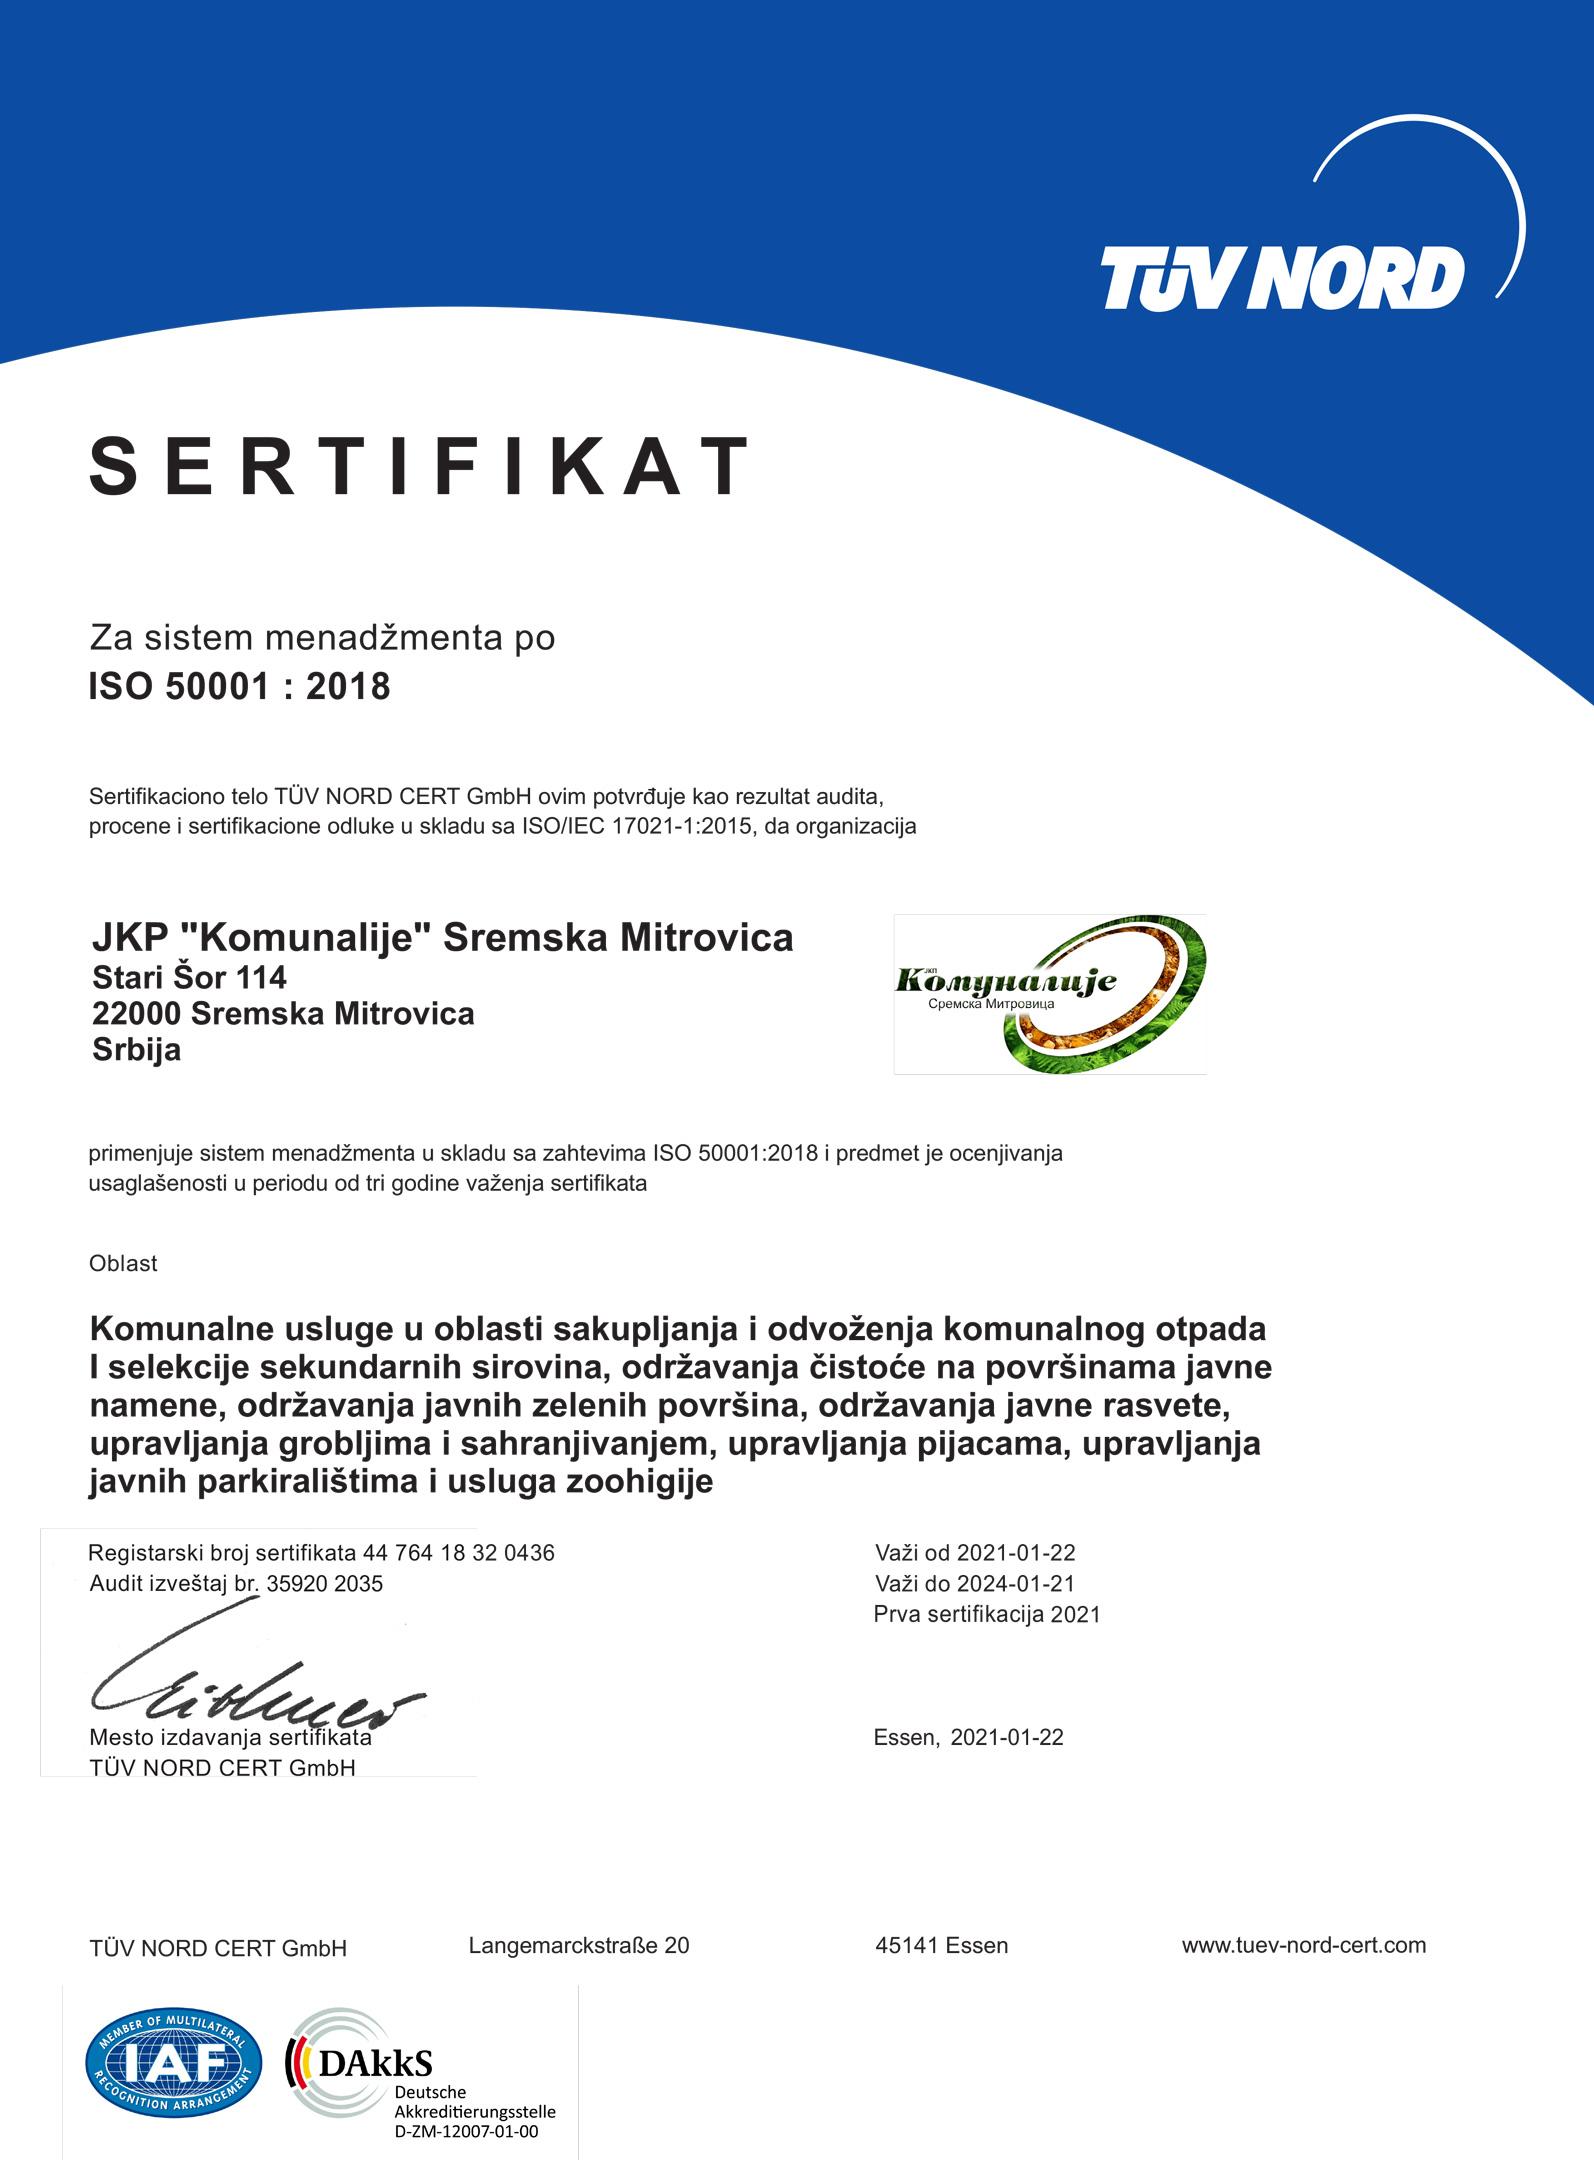 JKP-konunalije-cert-50001